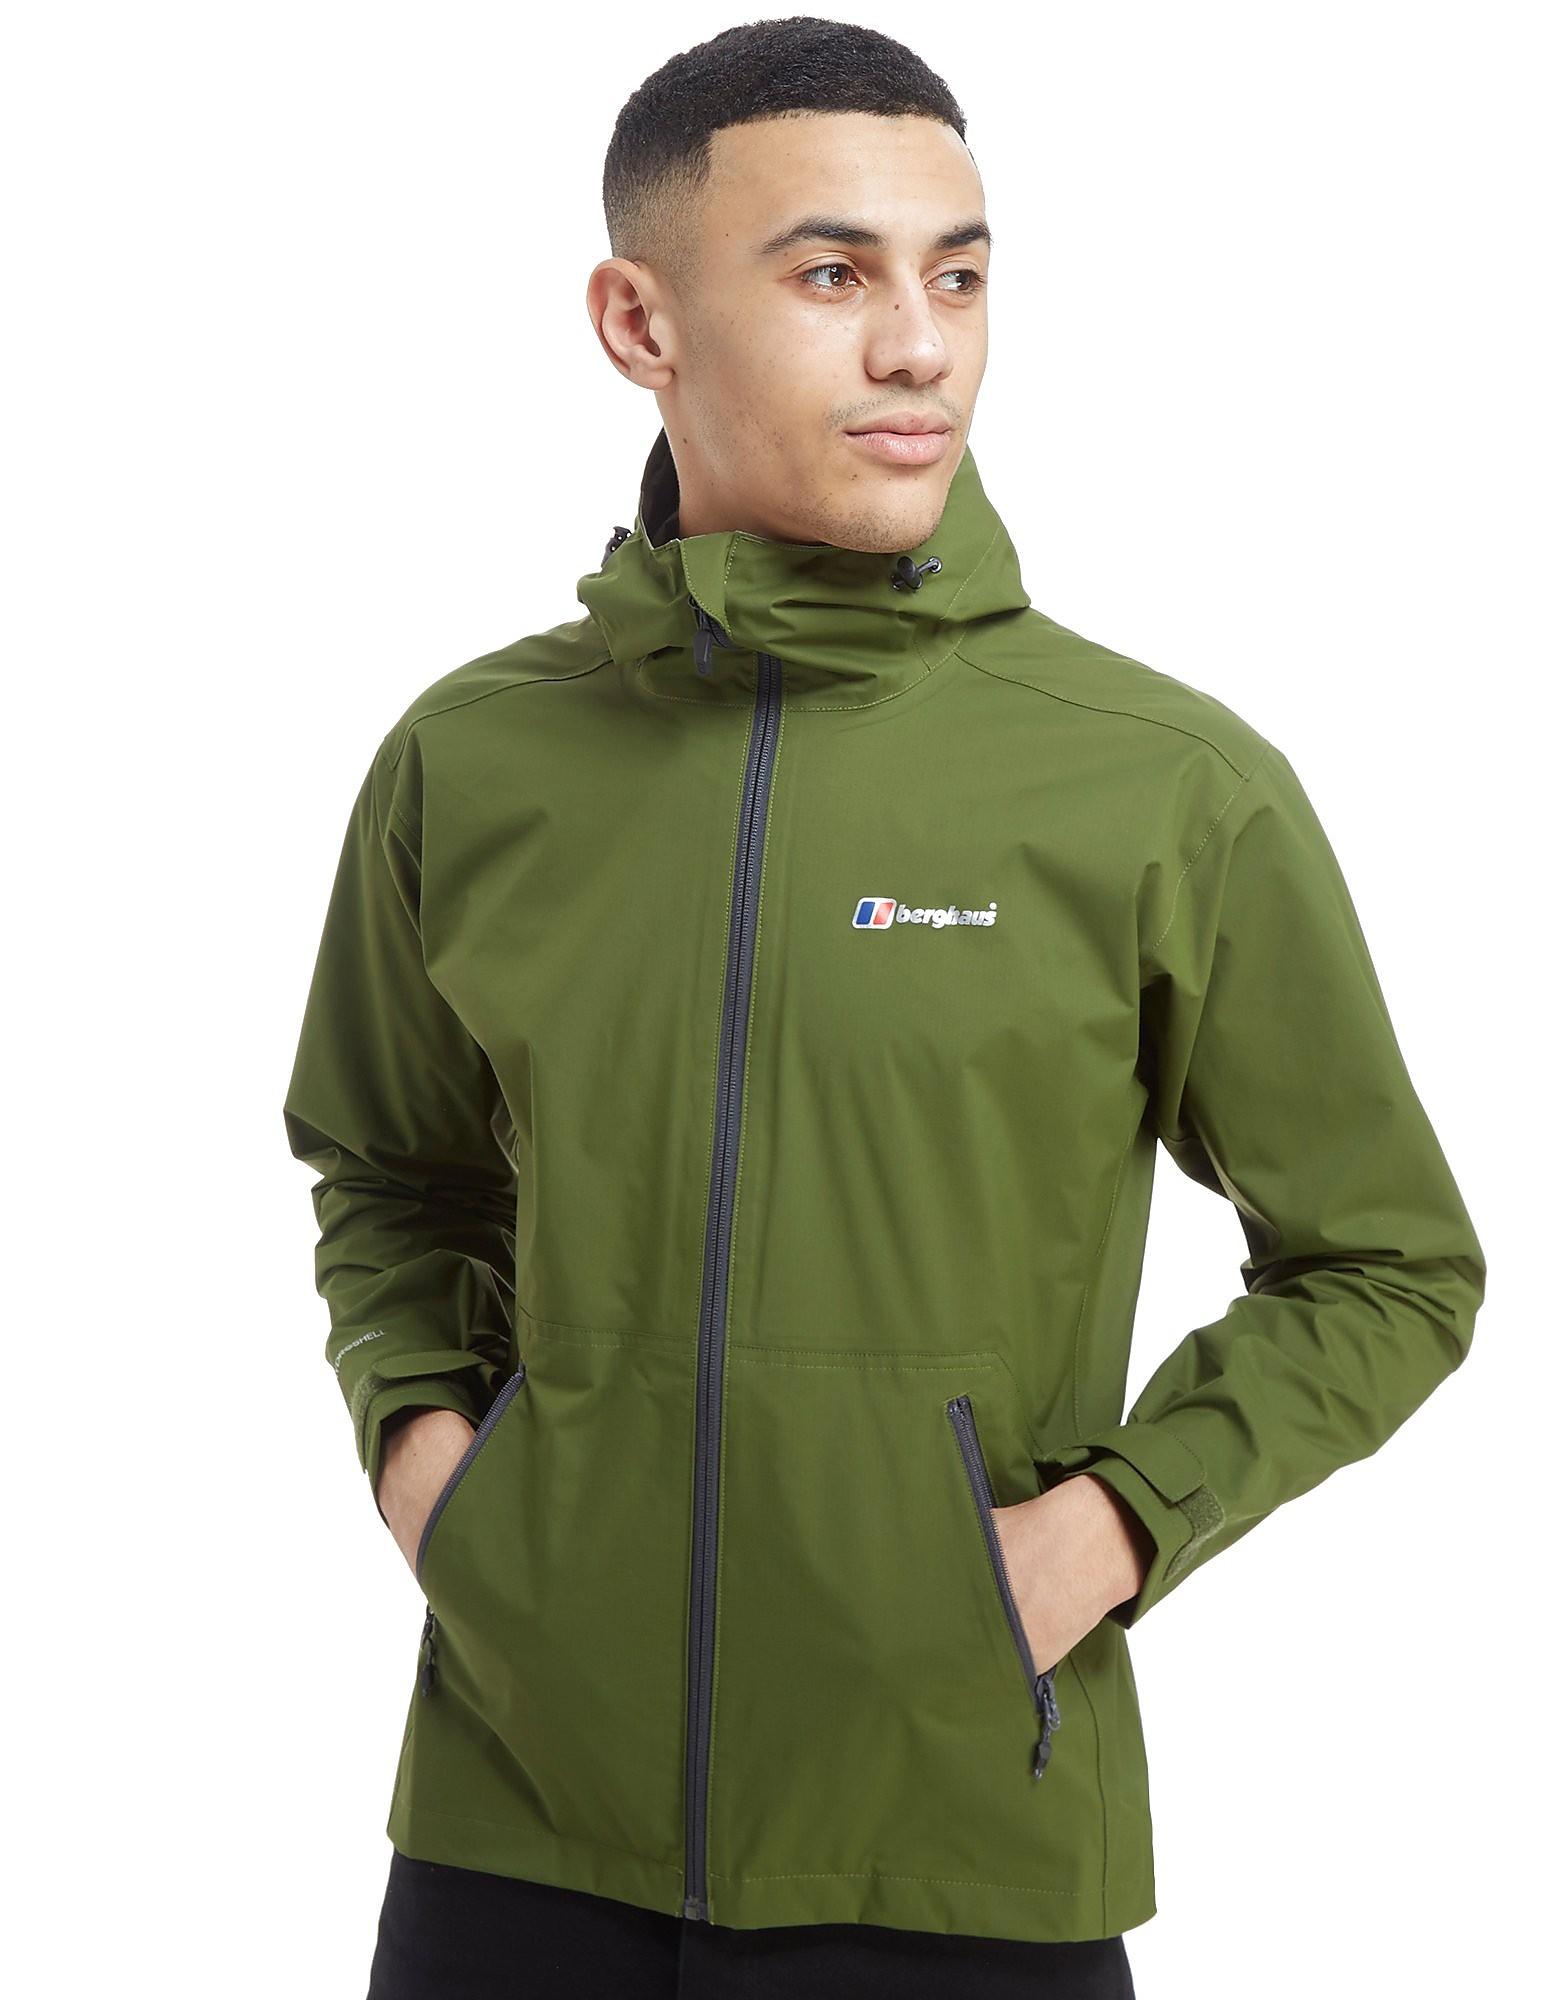 Berghaus Stormcloud Full Zip Jacket